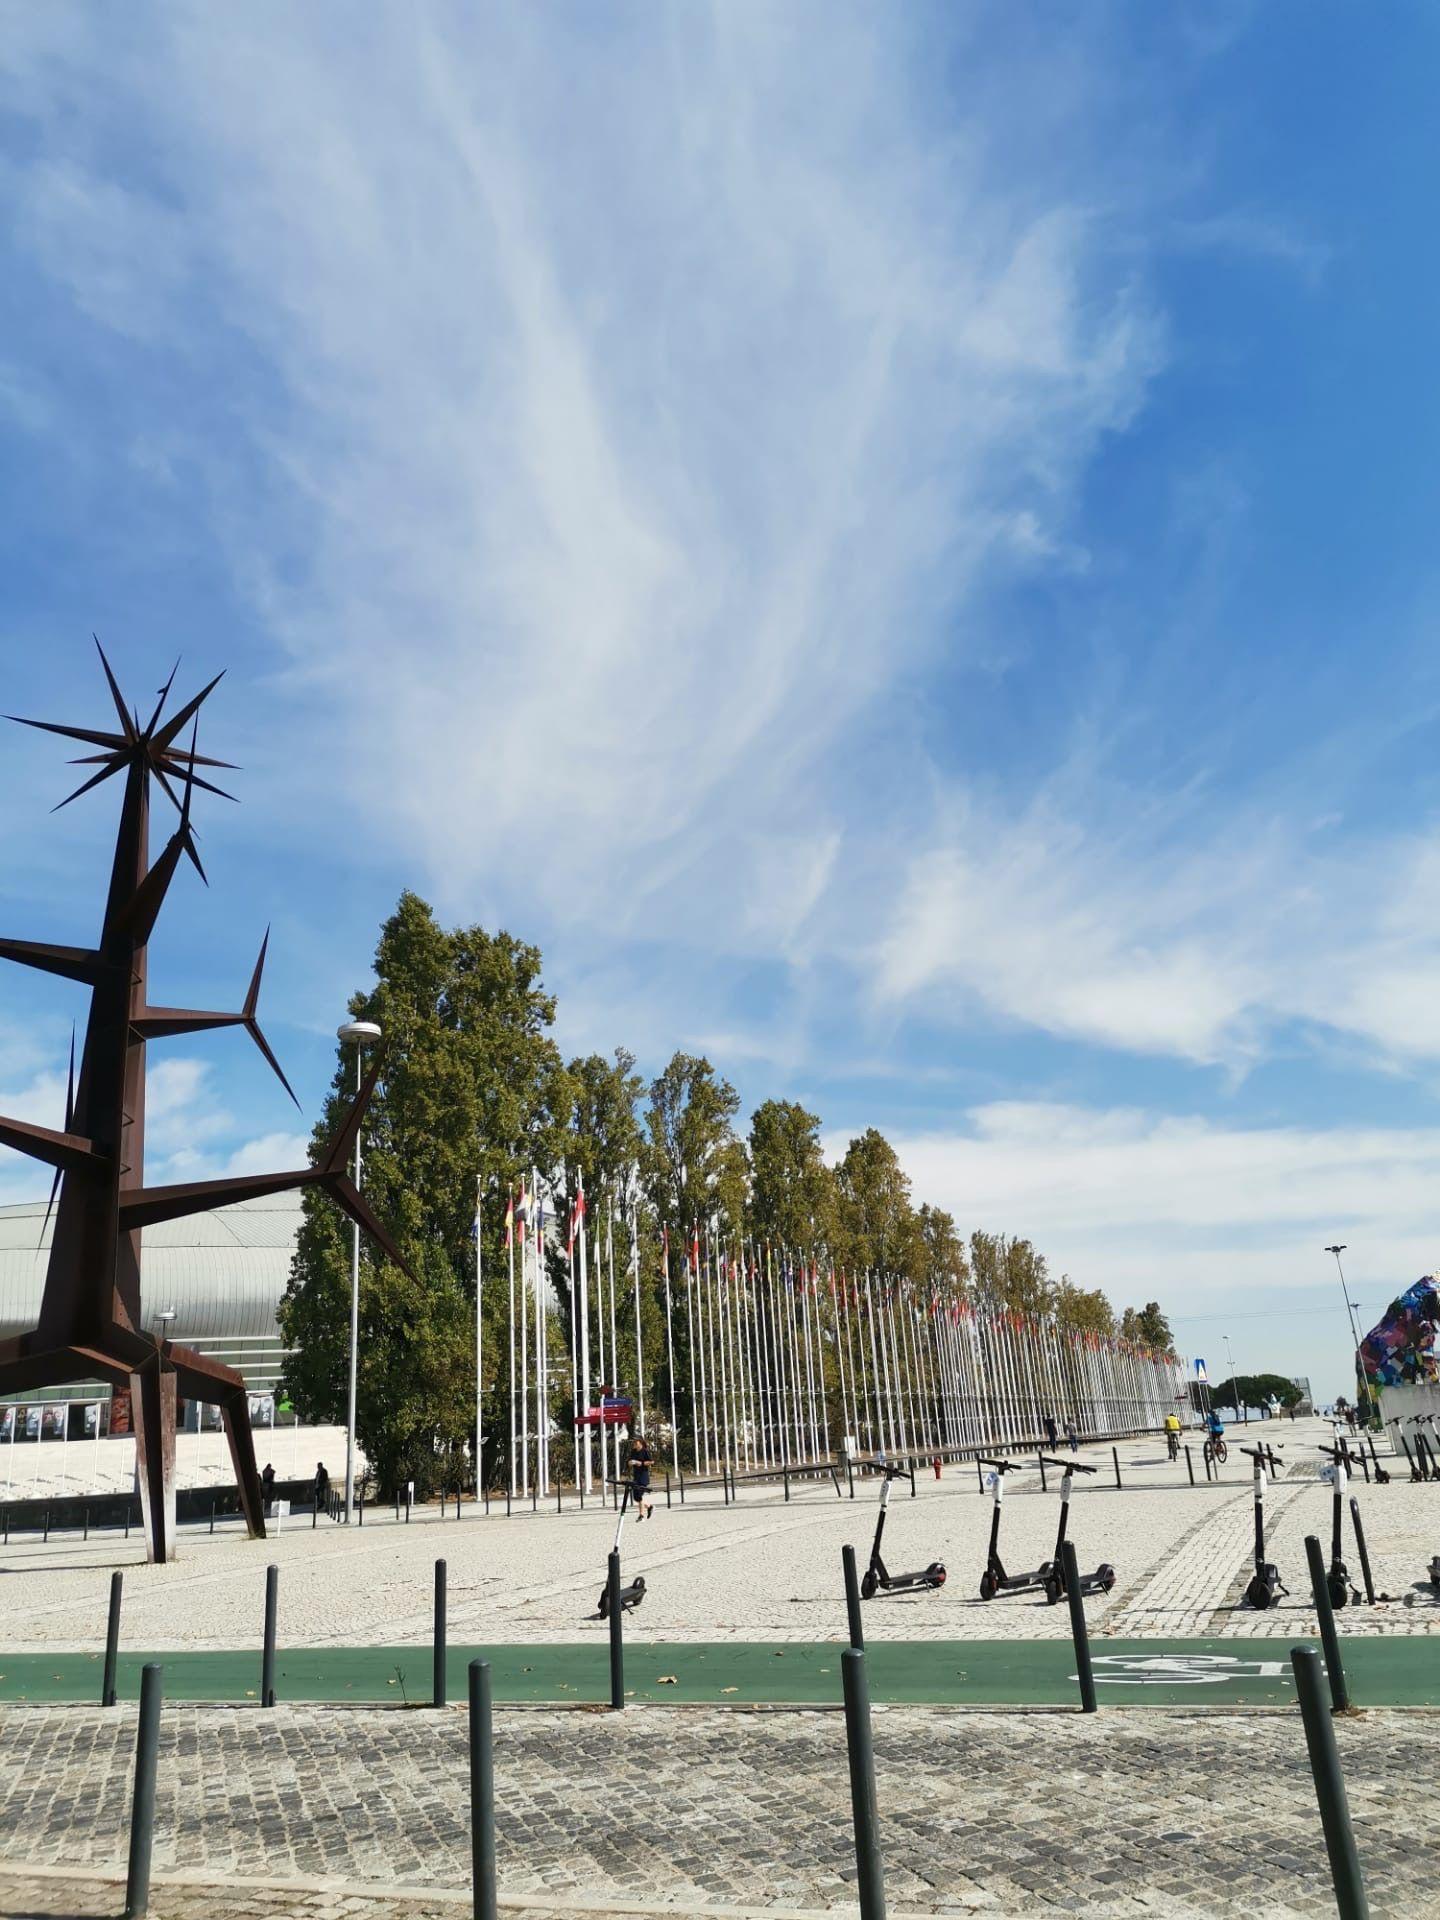 Art - Park of Nations in Lisbon Portugal